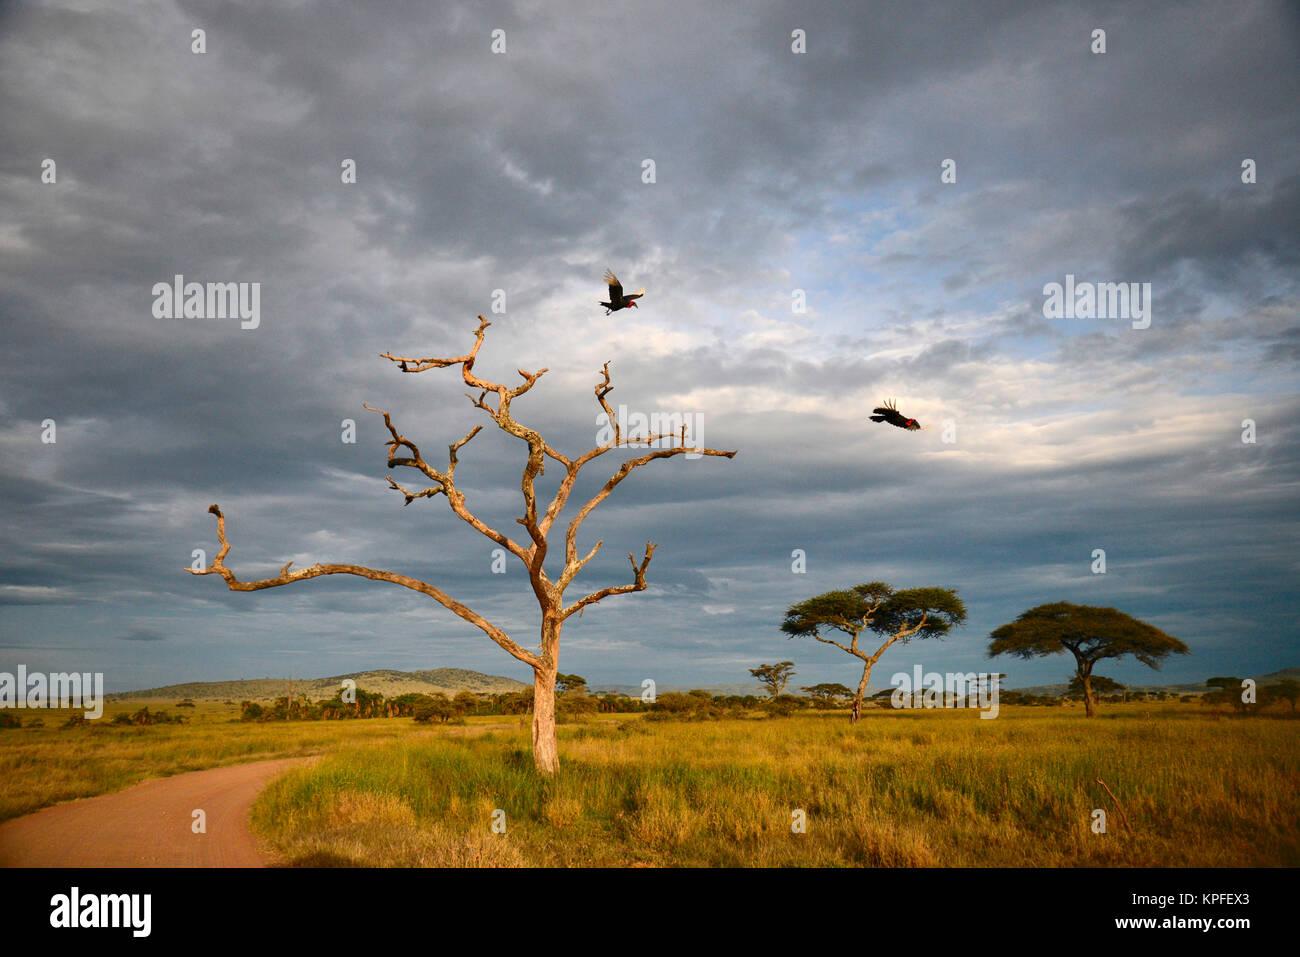 Wildlife sightseeing in one of the prime wildlife destinations on earht -- Serengeti, Tanzania. Ground hornbills - Stock Image